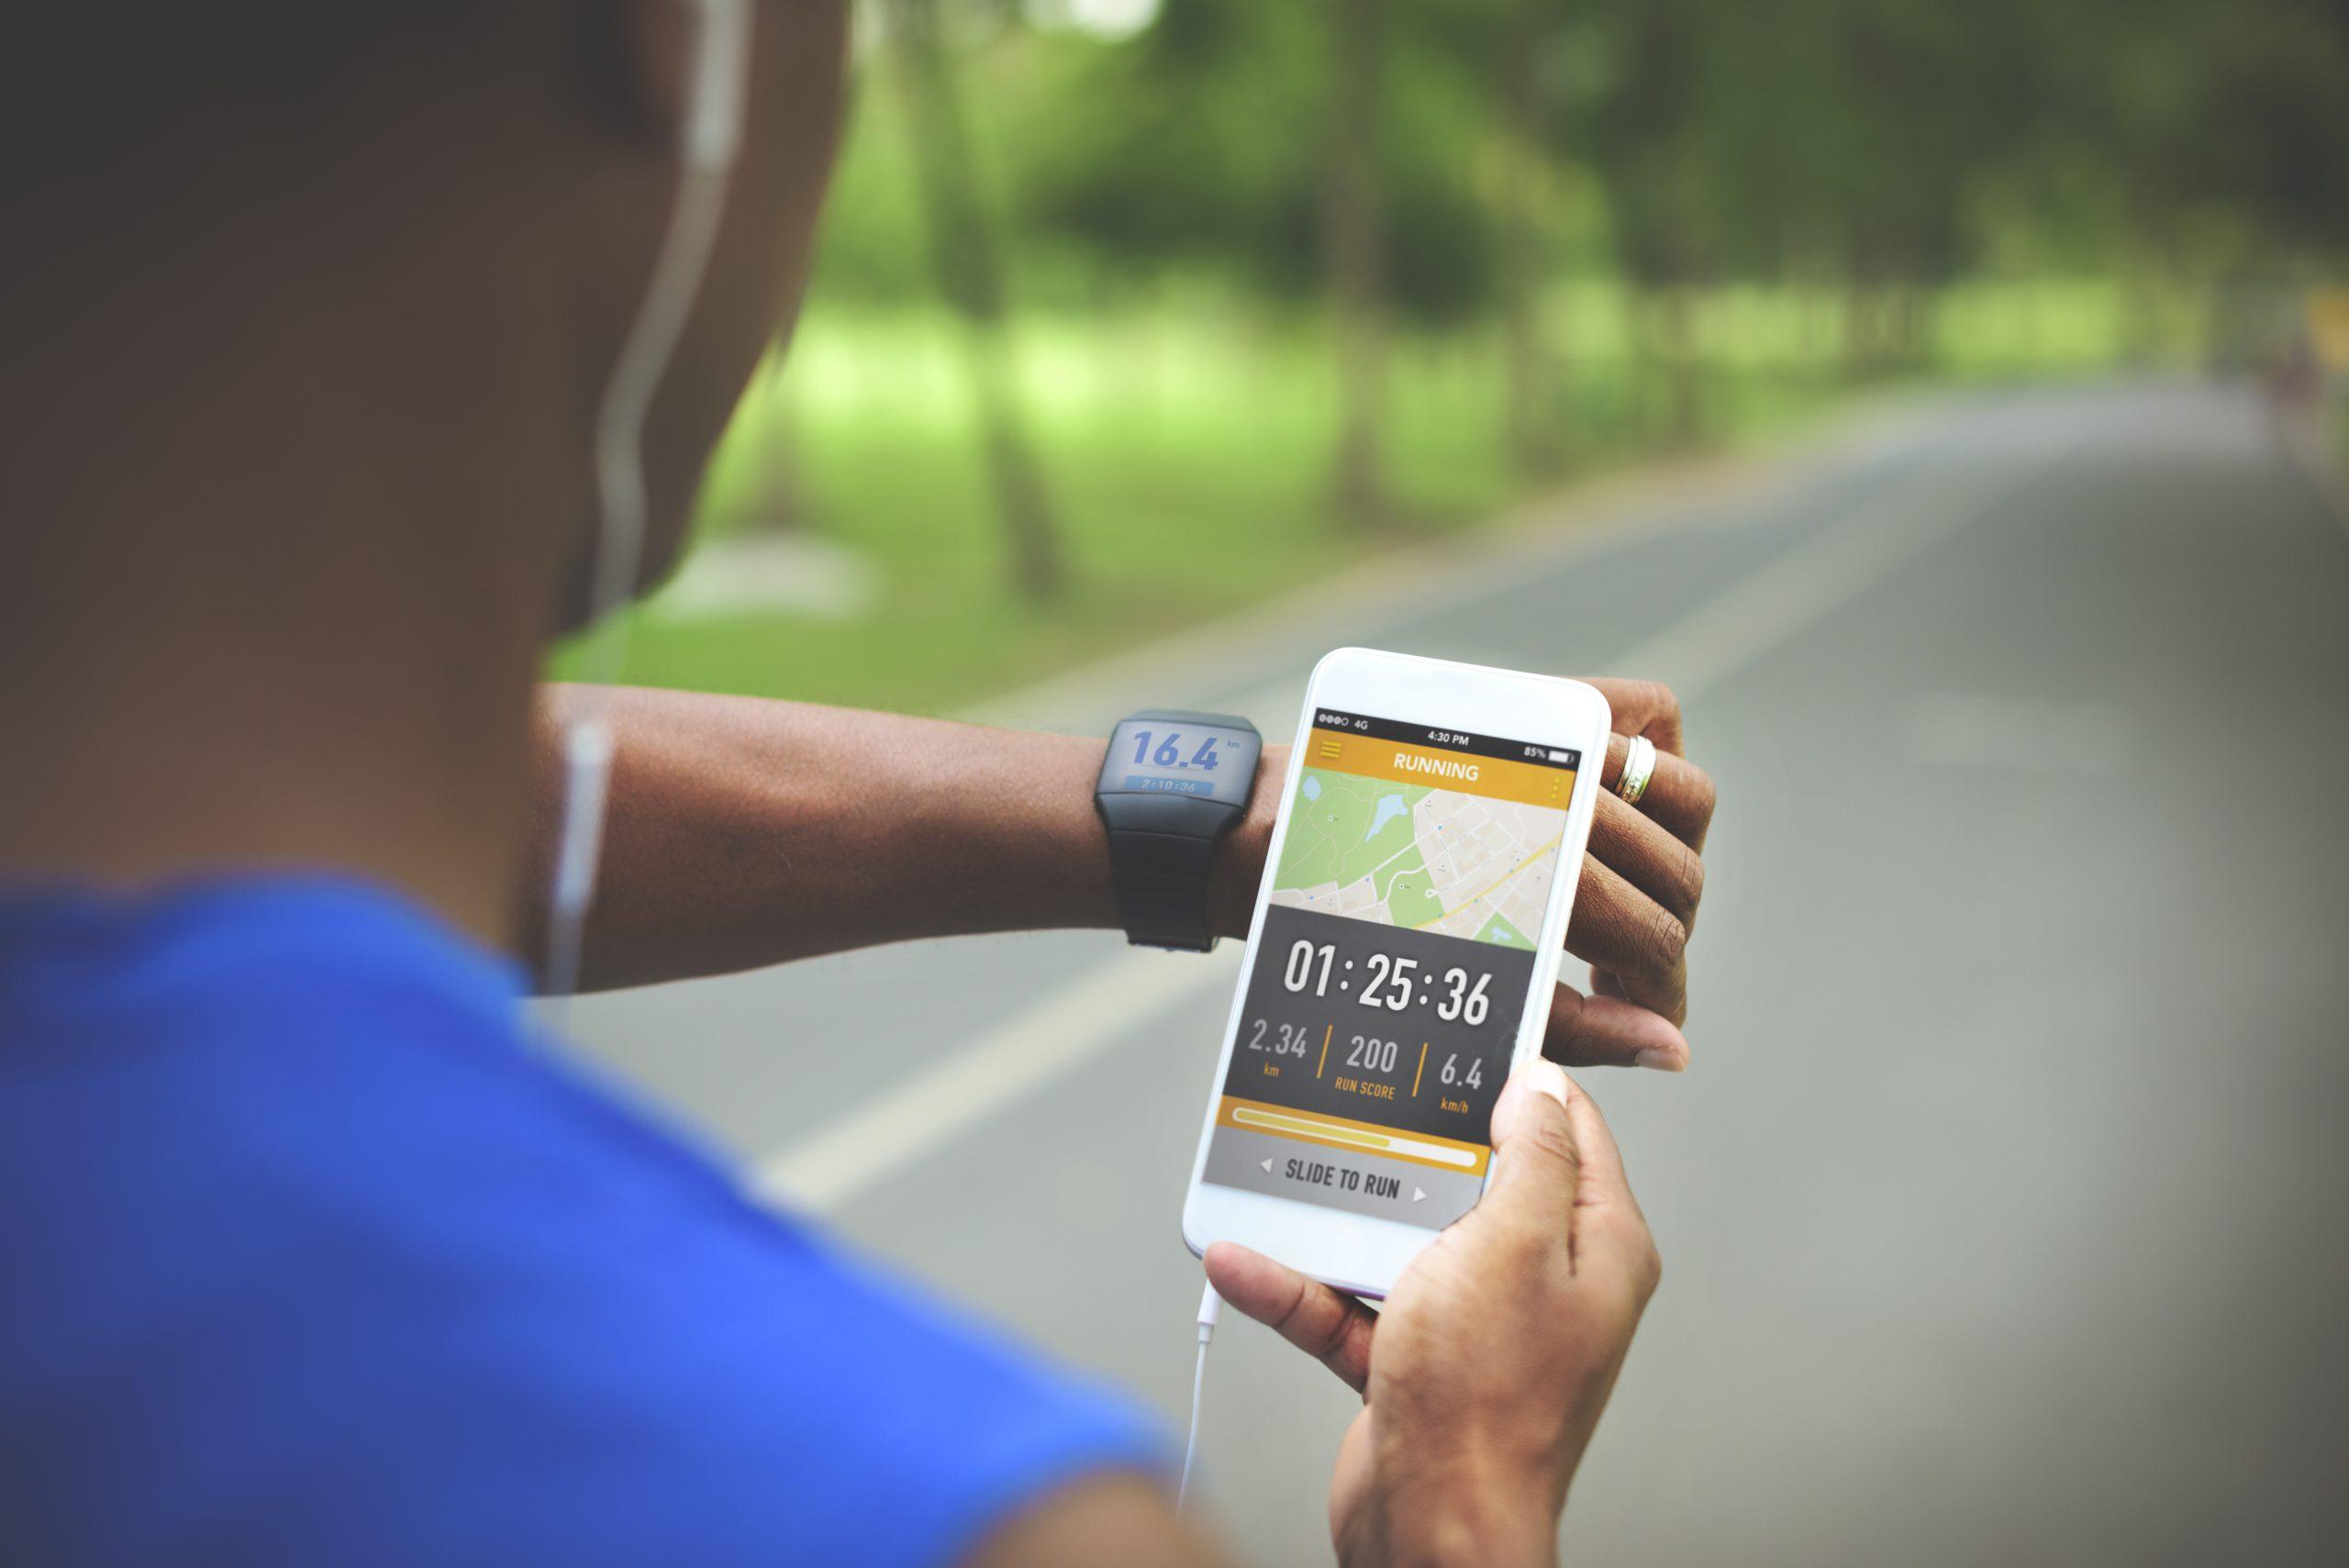 Top 5 des meilleures applications running gratuites